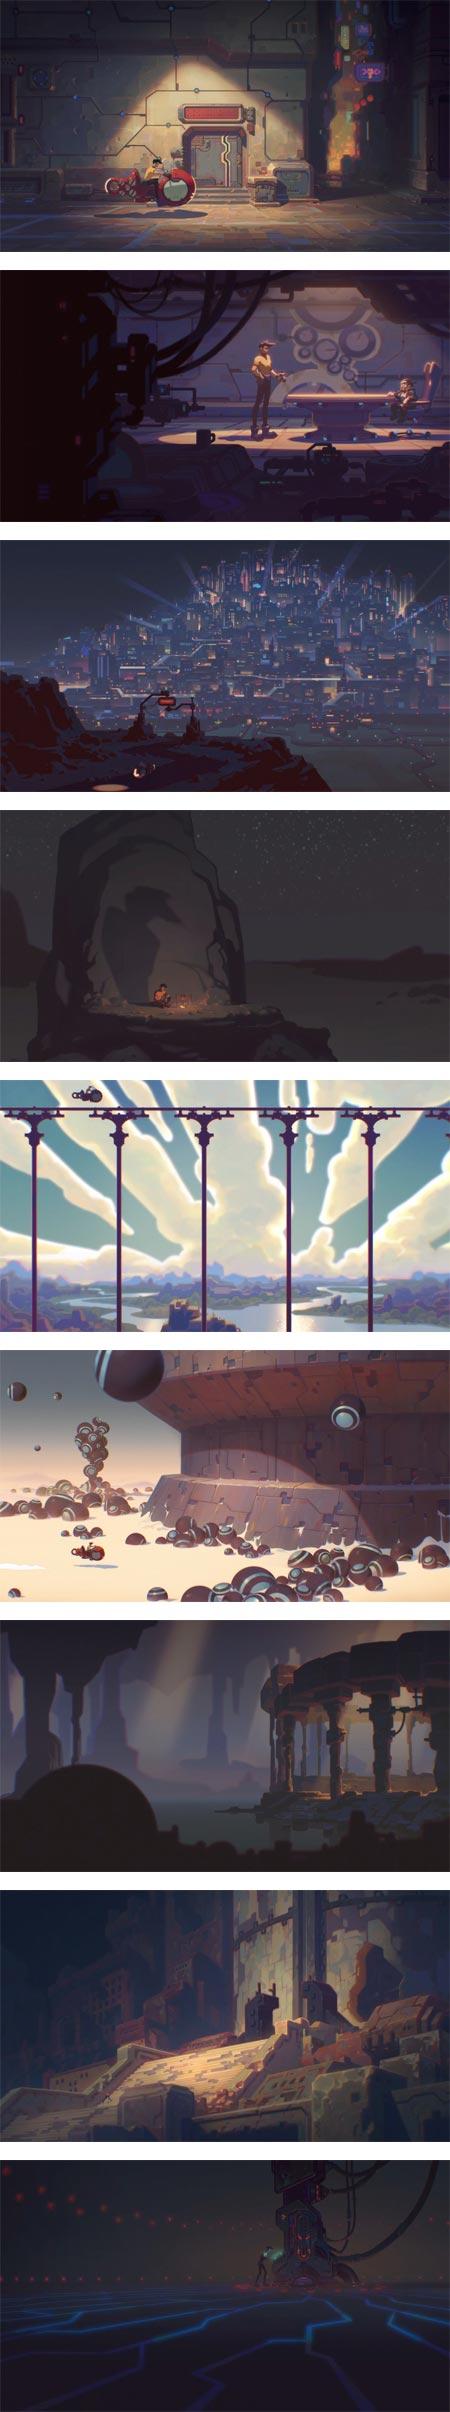 X-Story, Vitaliy Shushko, animation